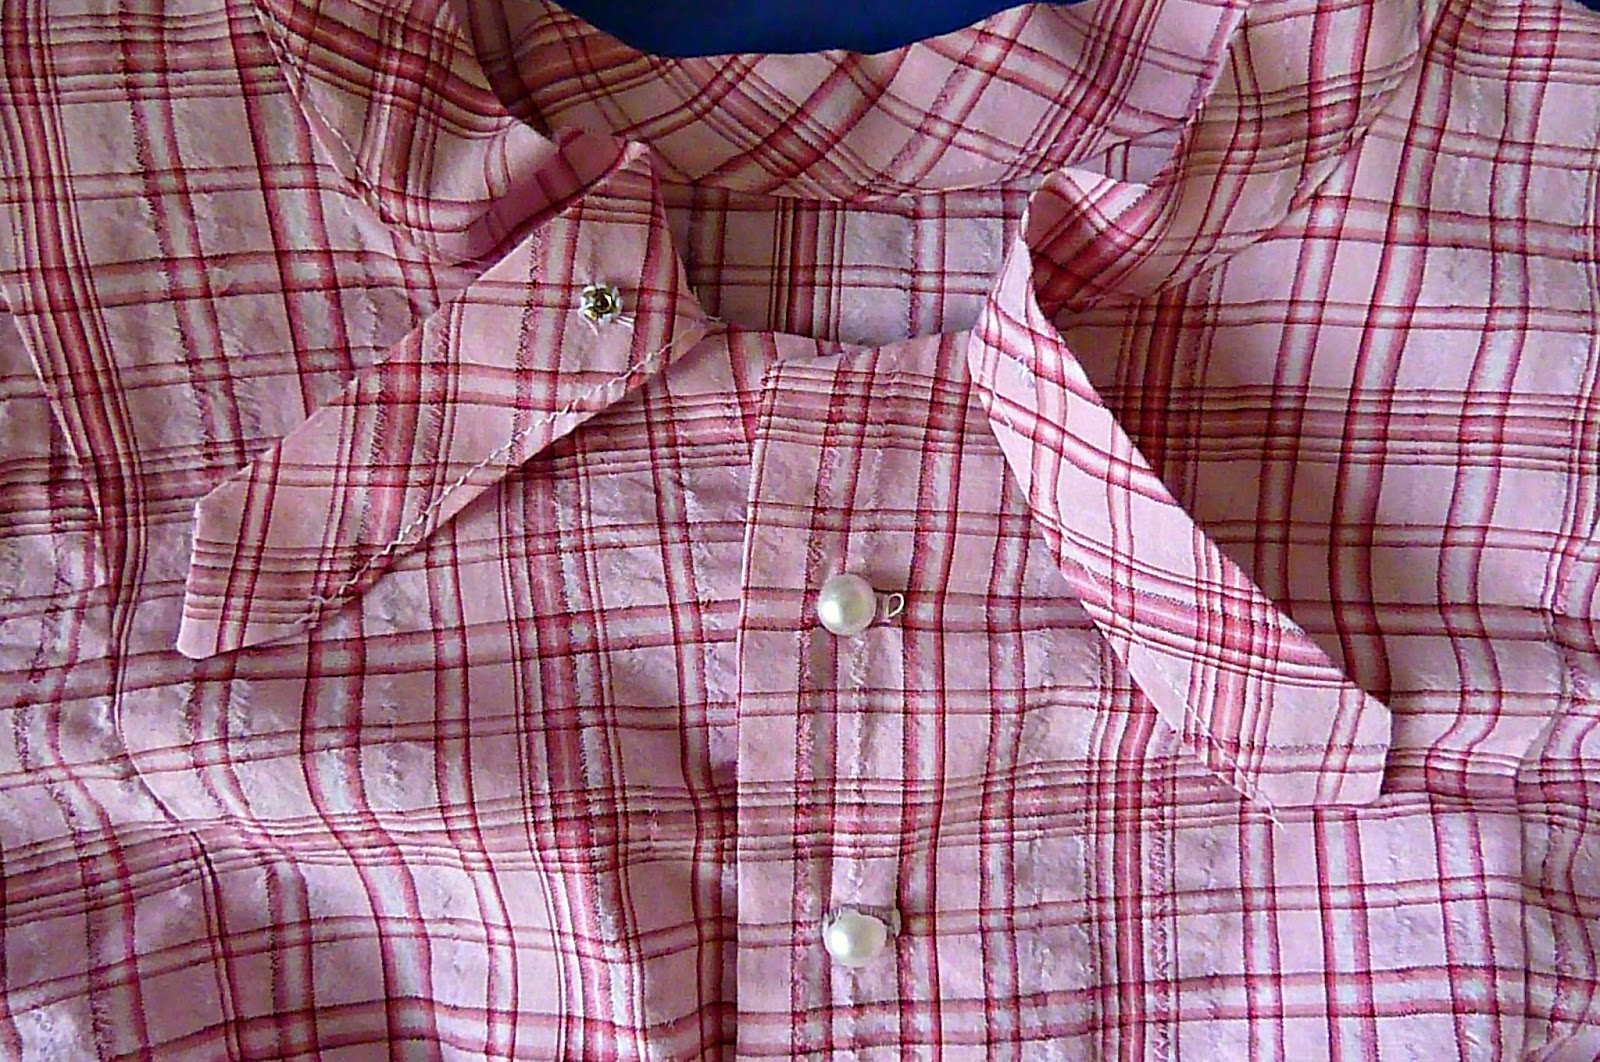 mrs pettigrew blouse, 40s blouse, vintage blouse